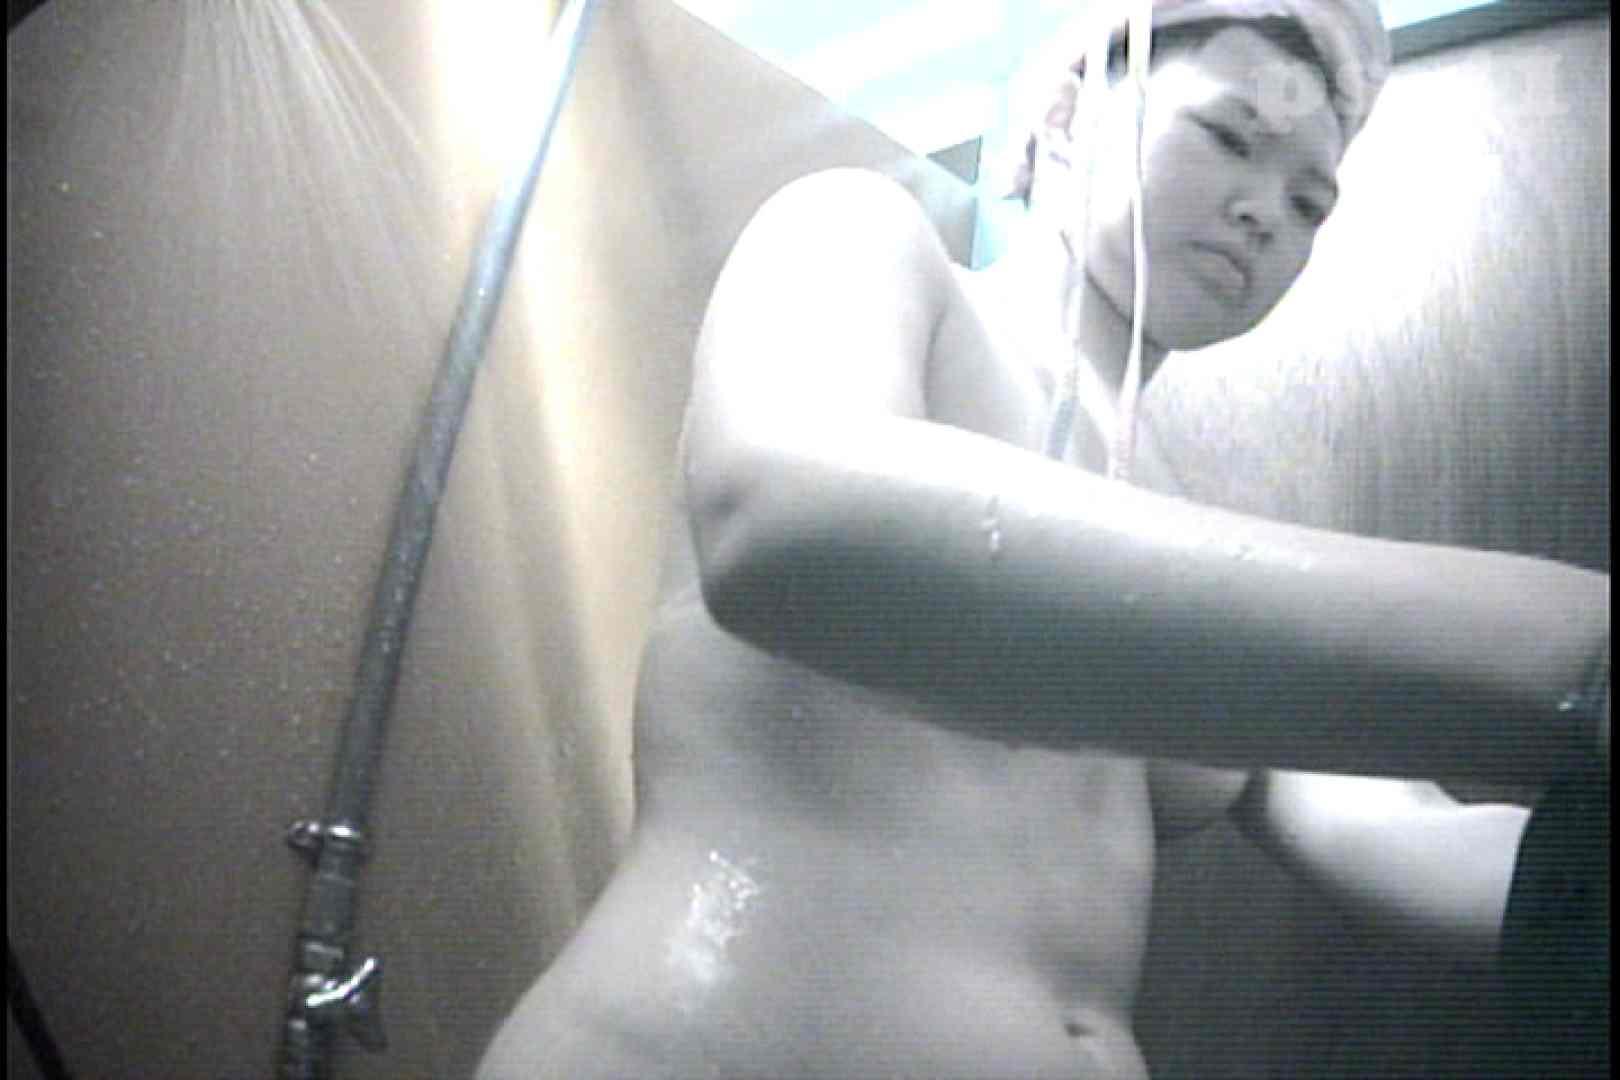 File.41 ムチムチギャル、大迫力の下半身 素人 濡れ場動画紹介 57連発 27